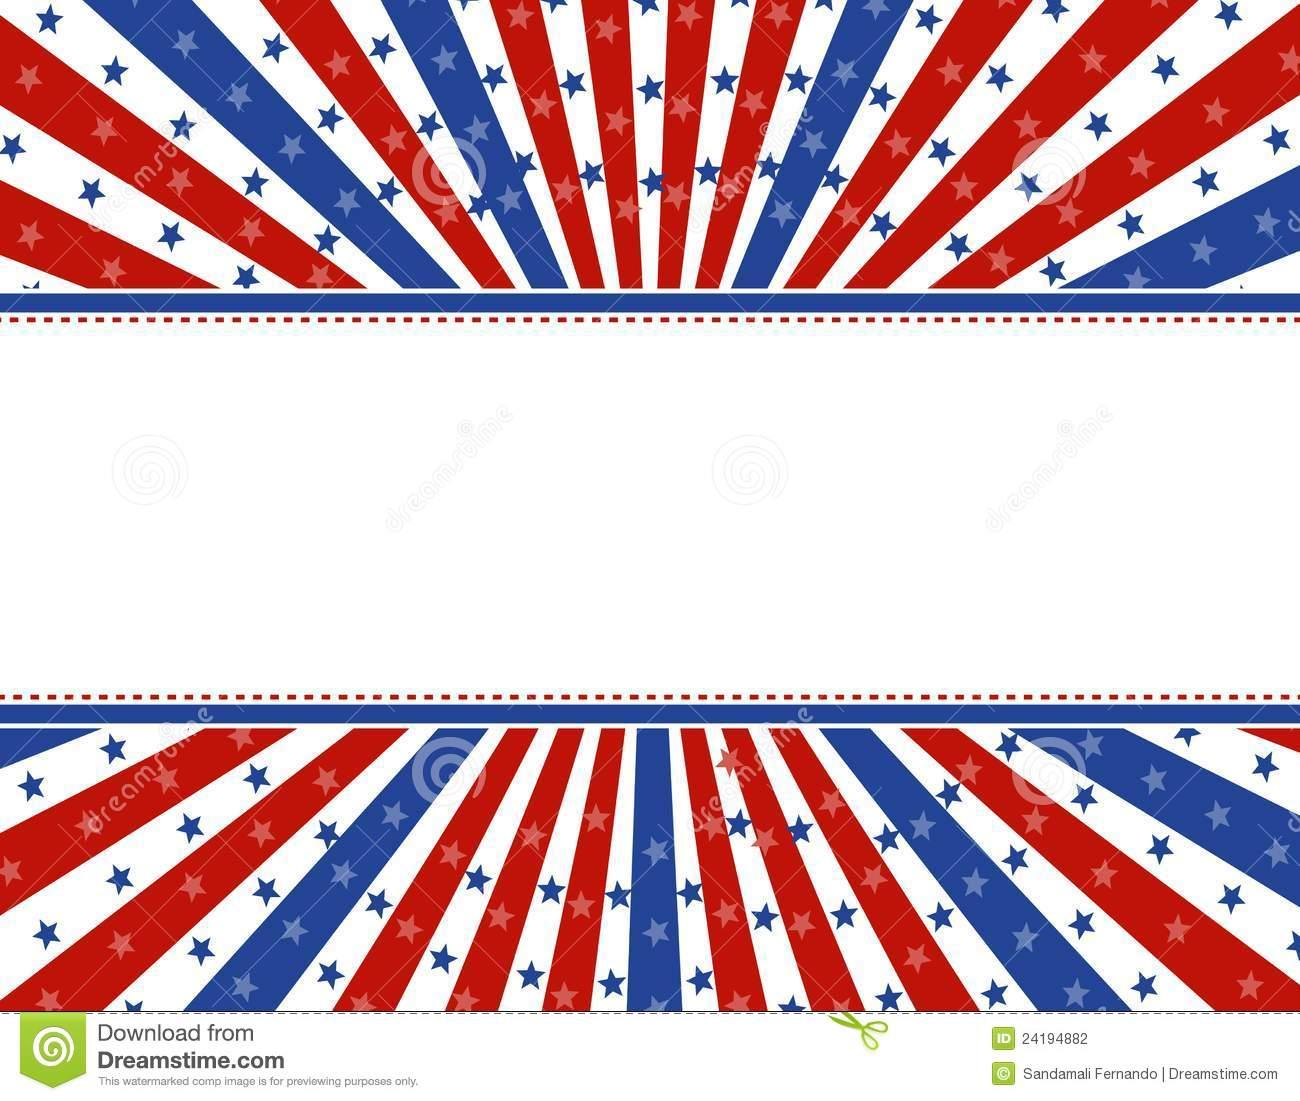 Patriotic border background | Clipart Panda - Free Clipart ...